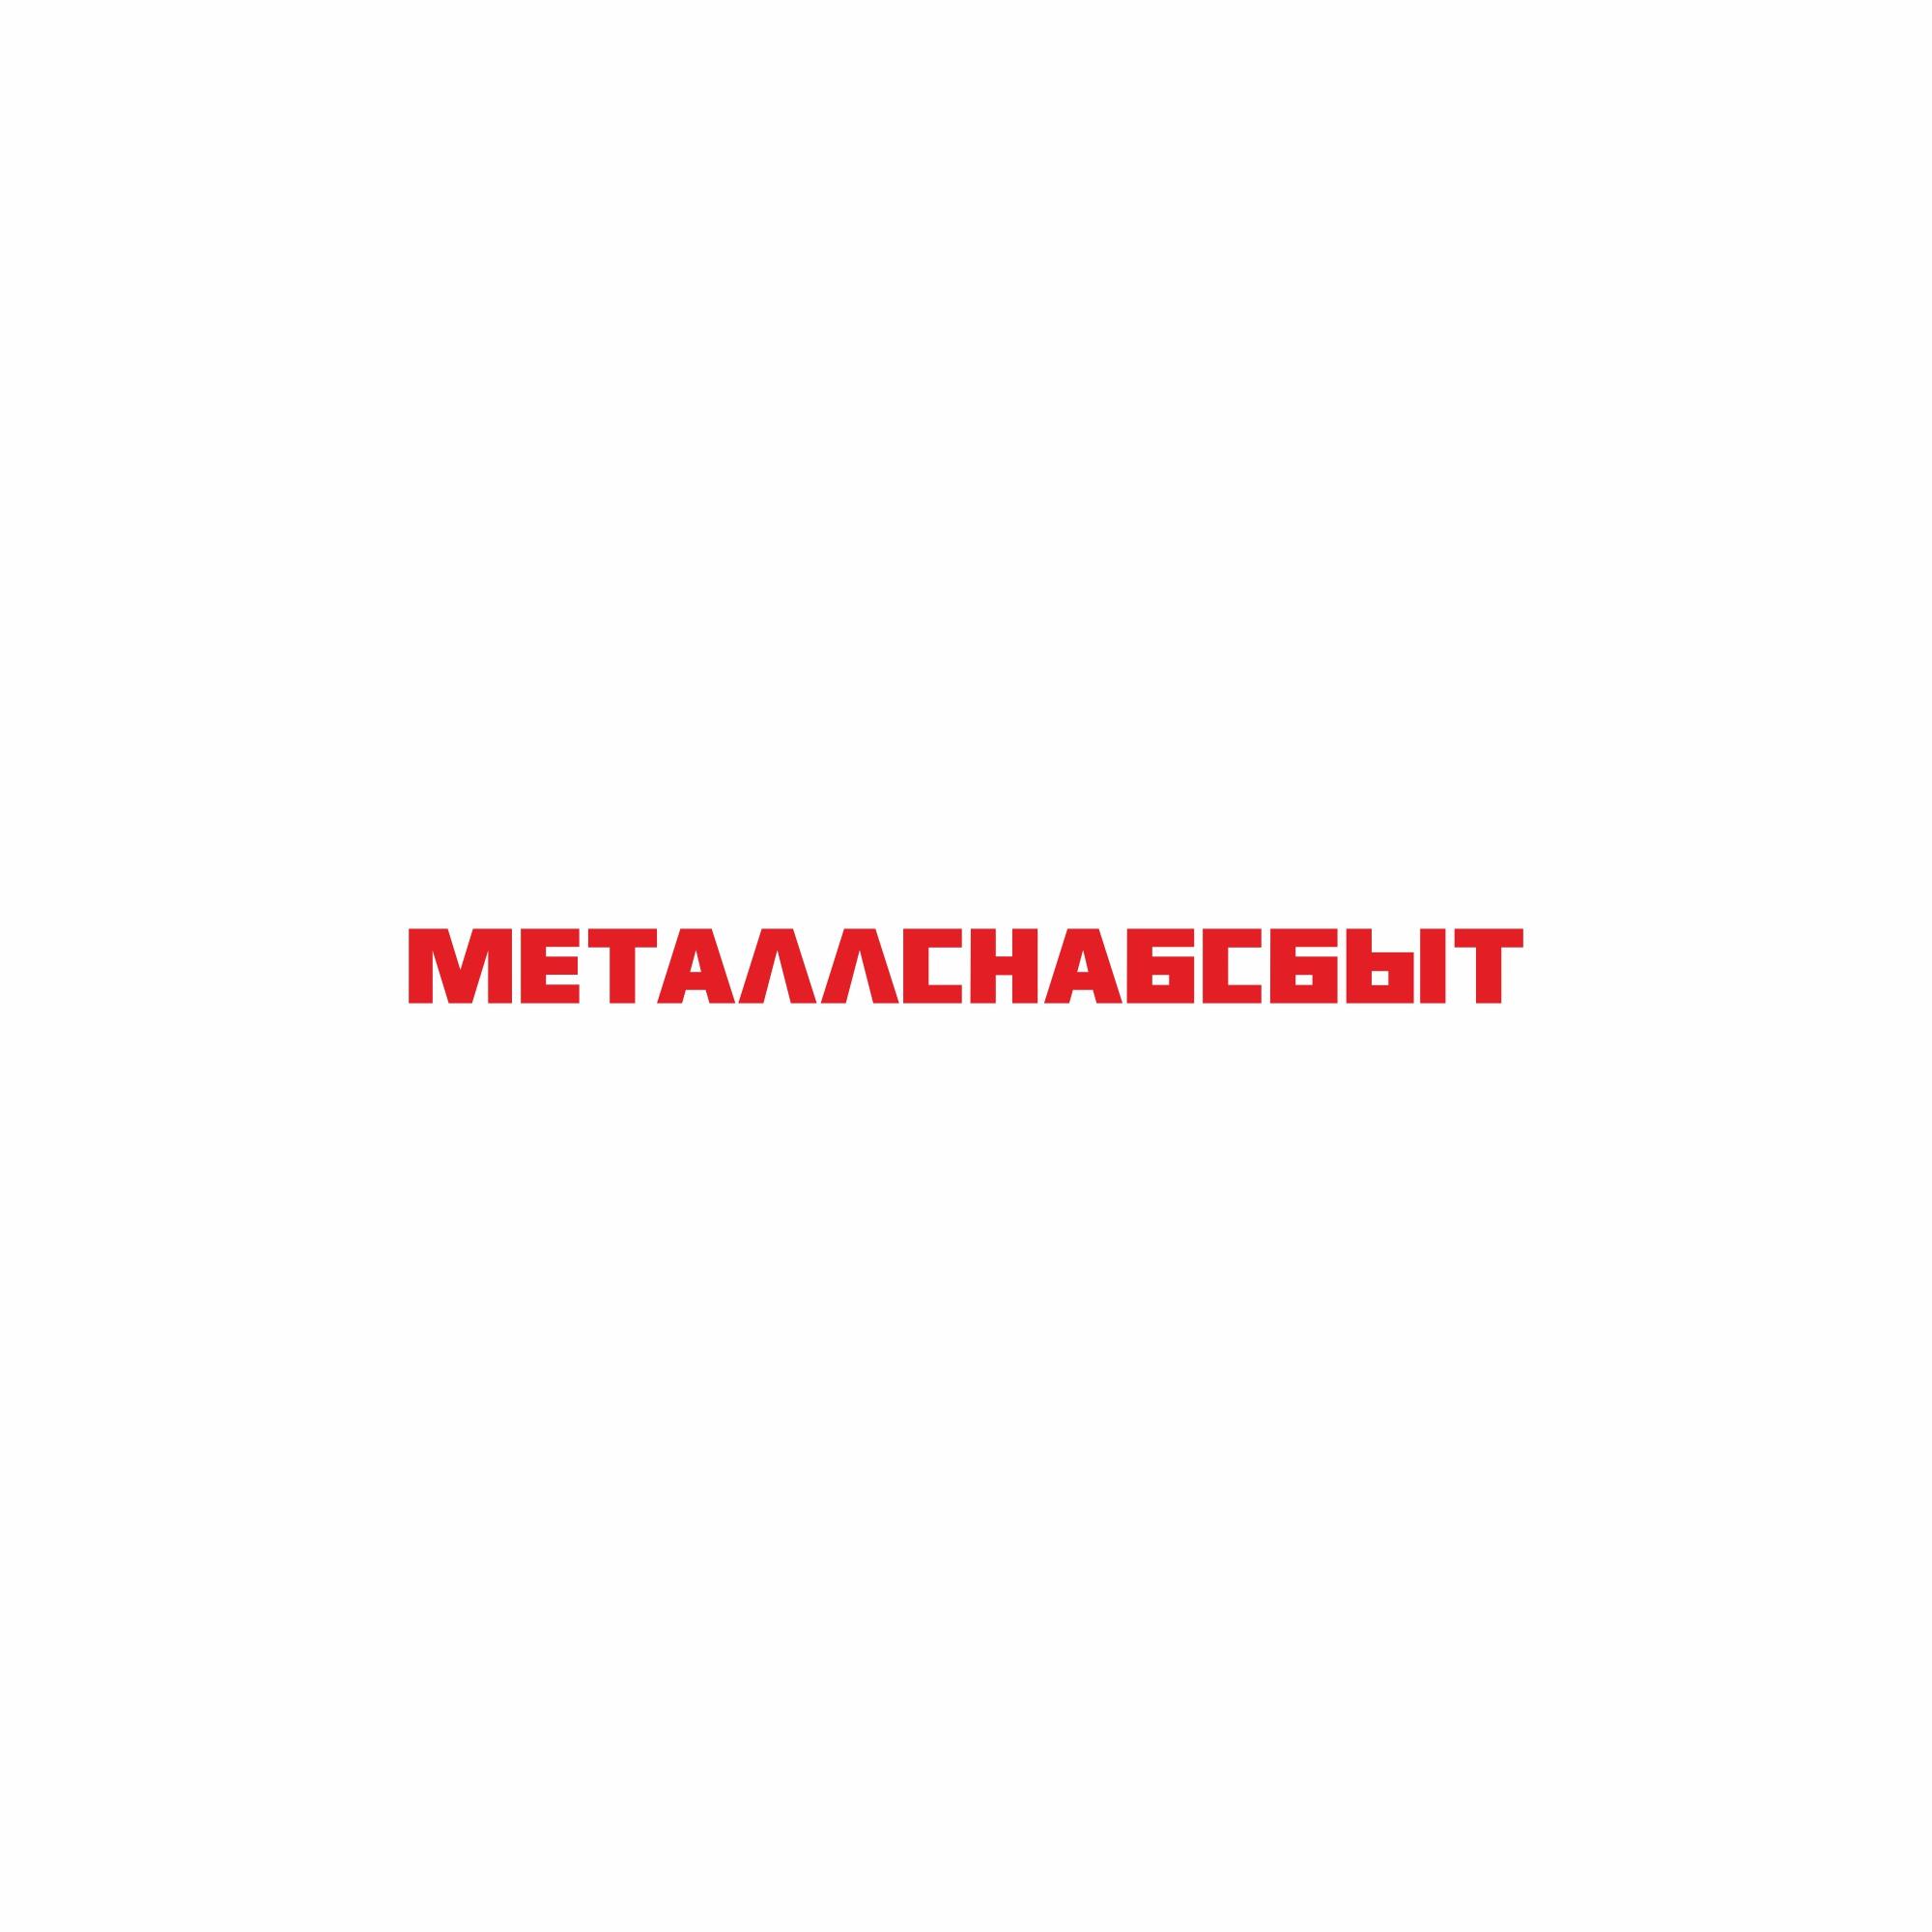 Создание фирменного стиля + логотип фото f_7625cfbf05654a17.jpg